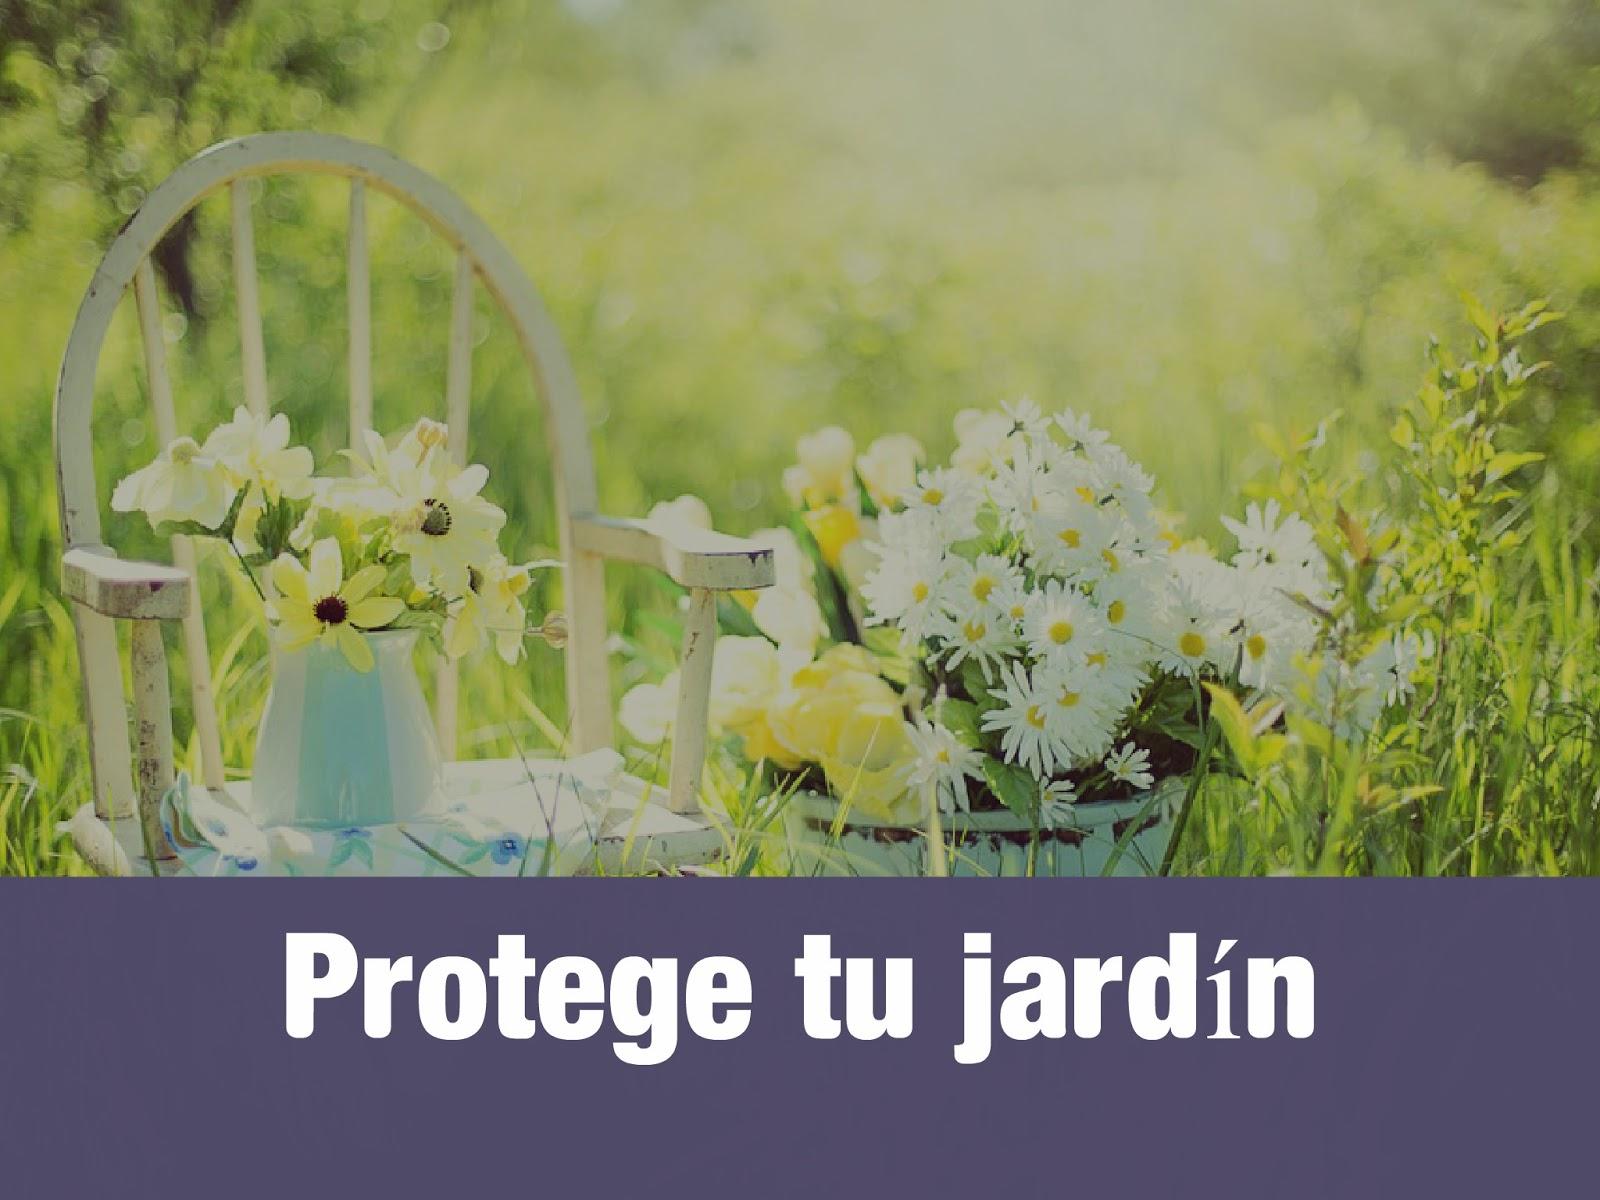 protege-tu-jardin-mosquitos